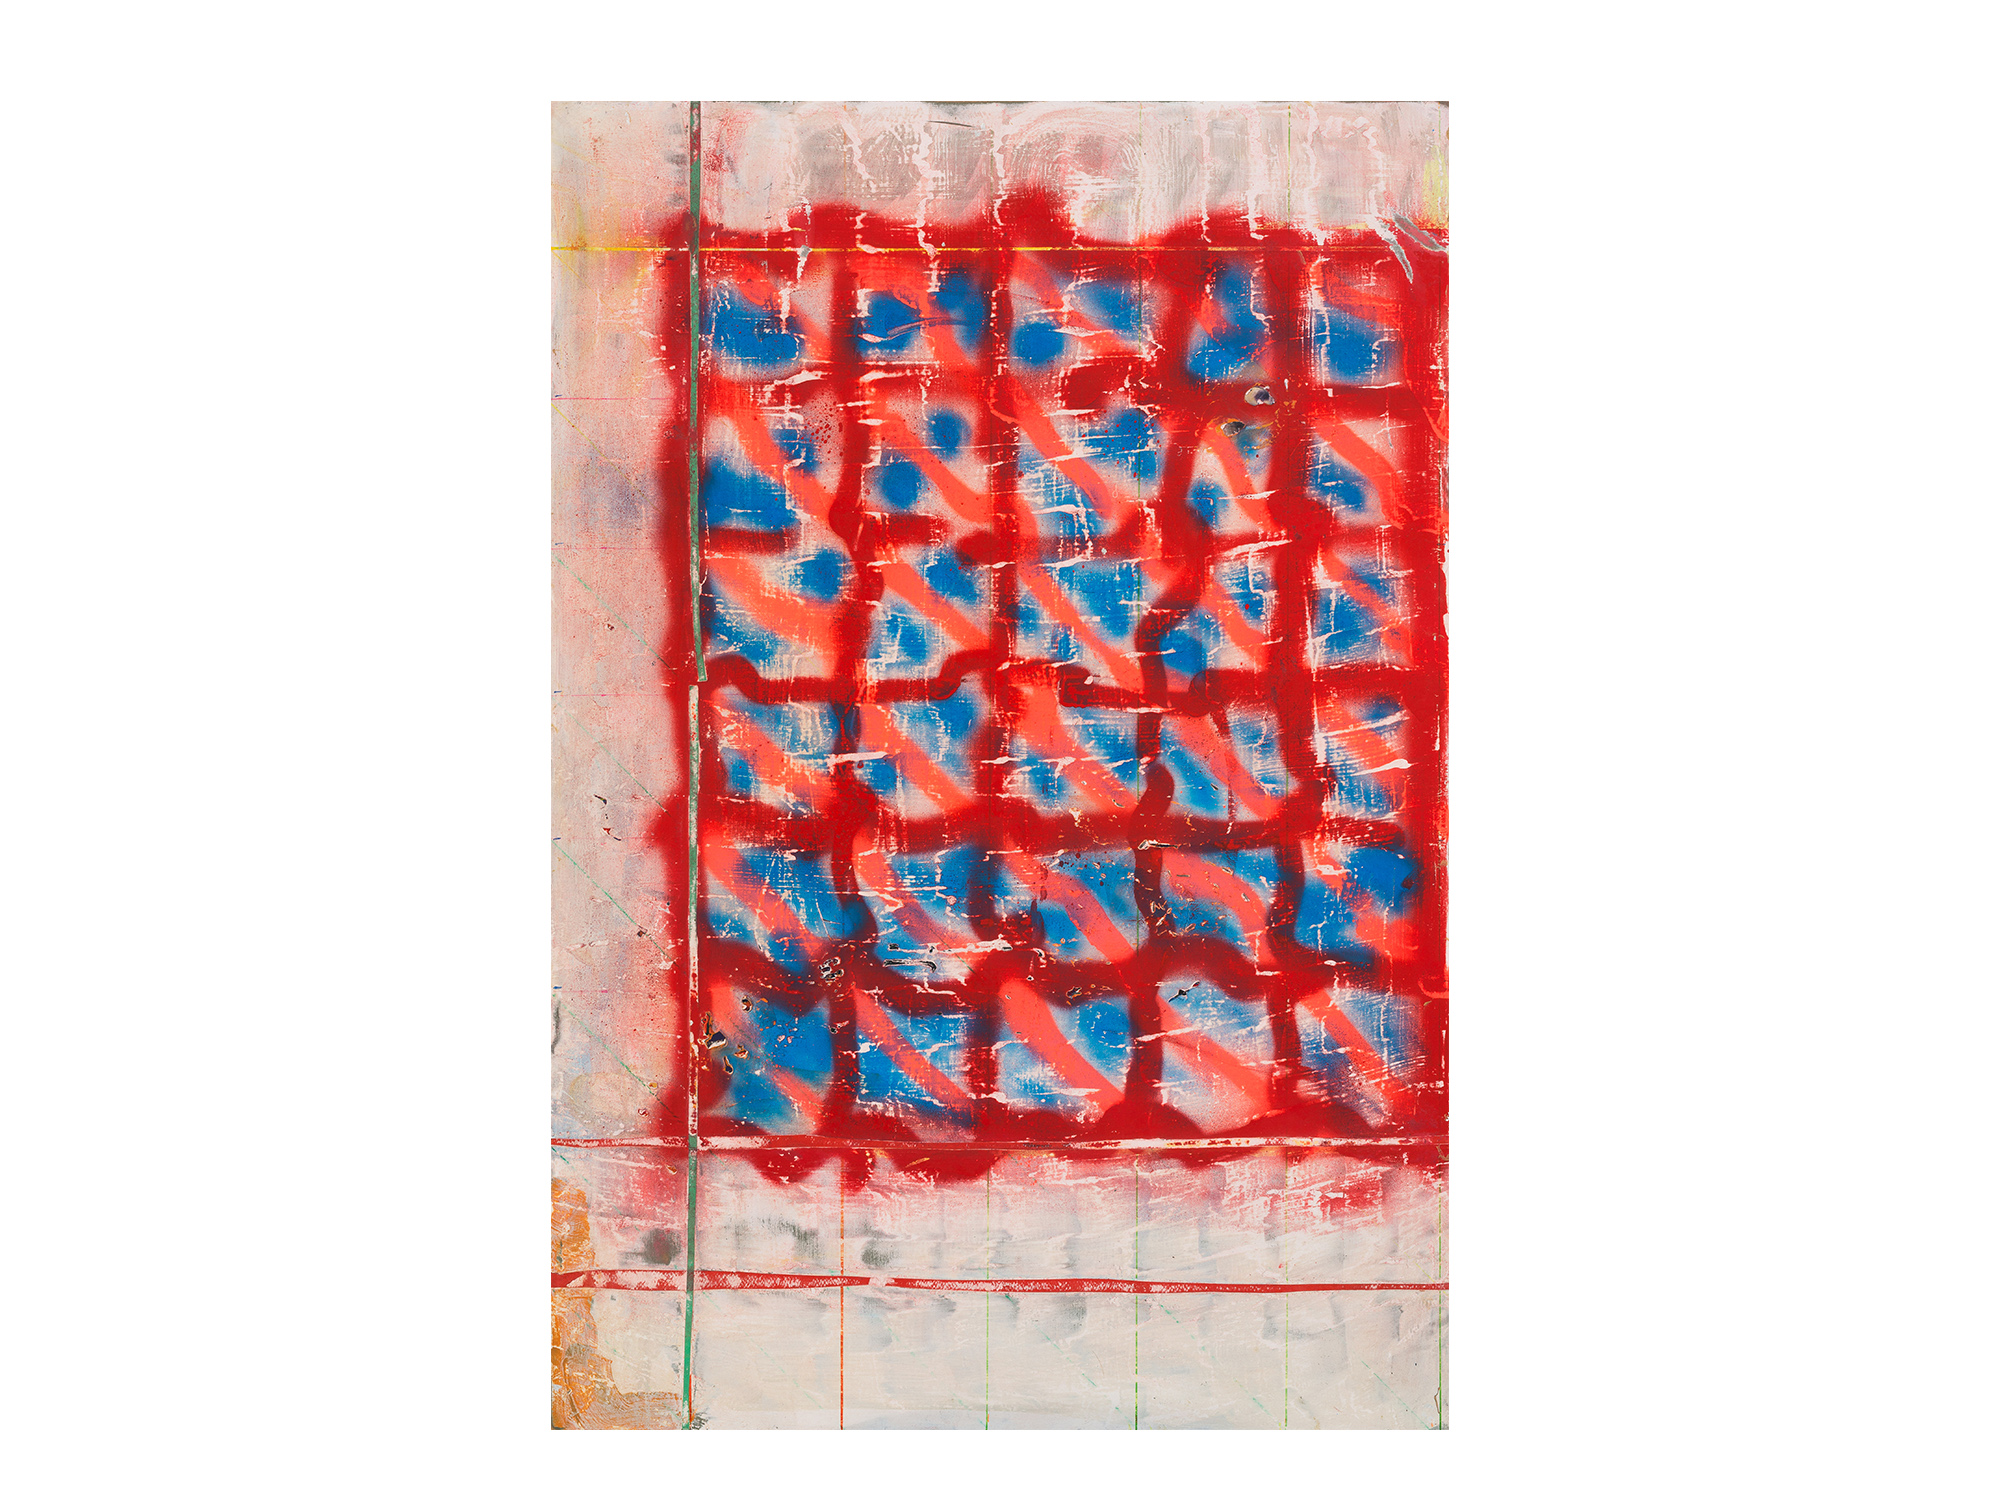 Tom Vincent   Sol Grid , 2017 acrylic, aerosol and paper on board 60 x 90cm   ARTIST BIO